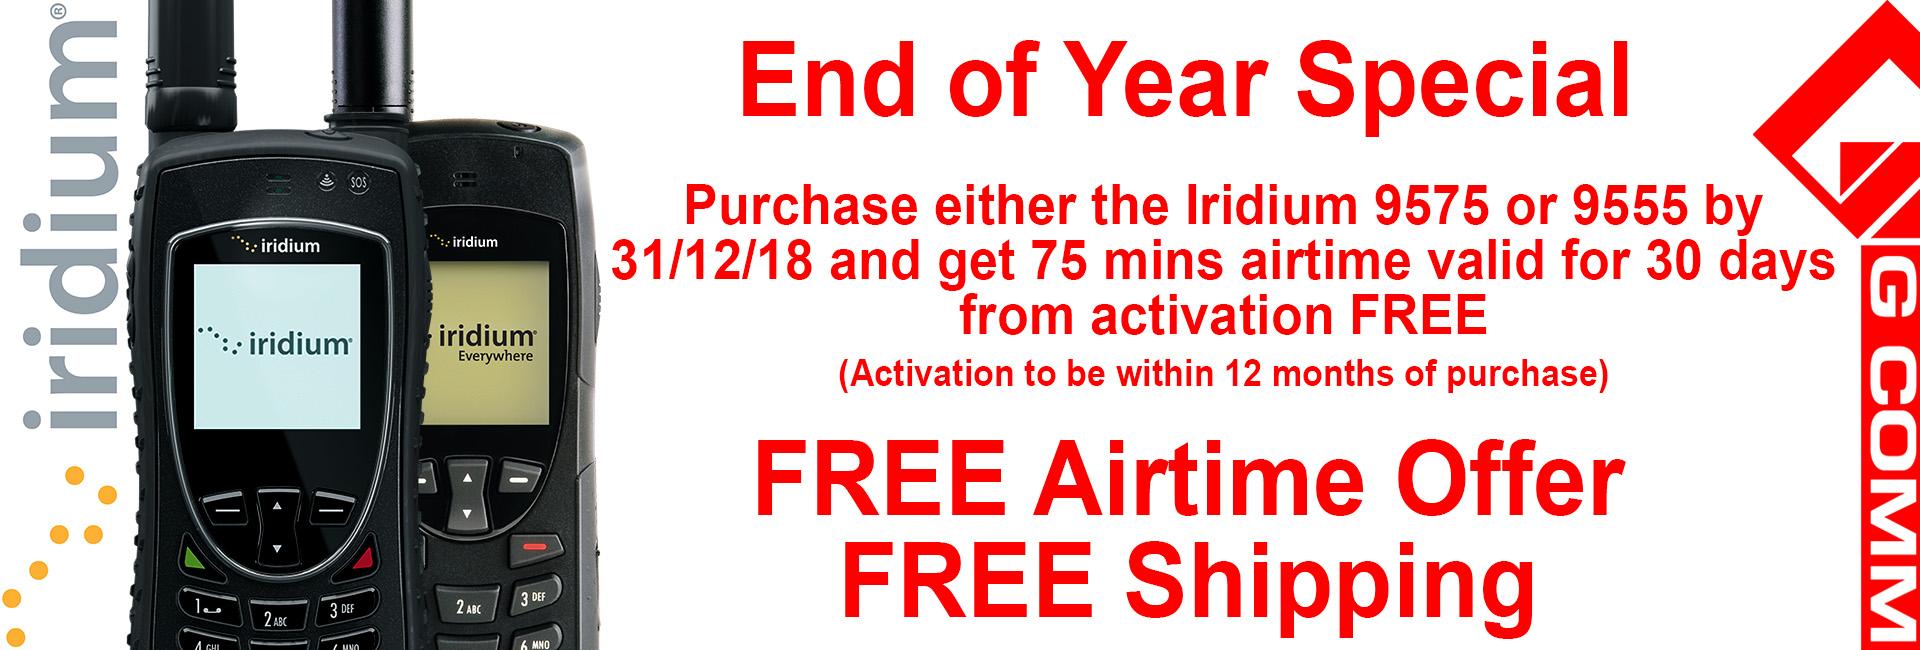 End of year special on Iridium satellite phones